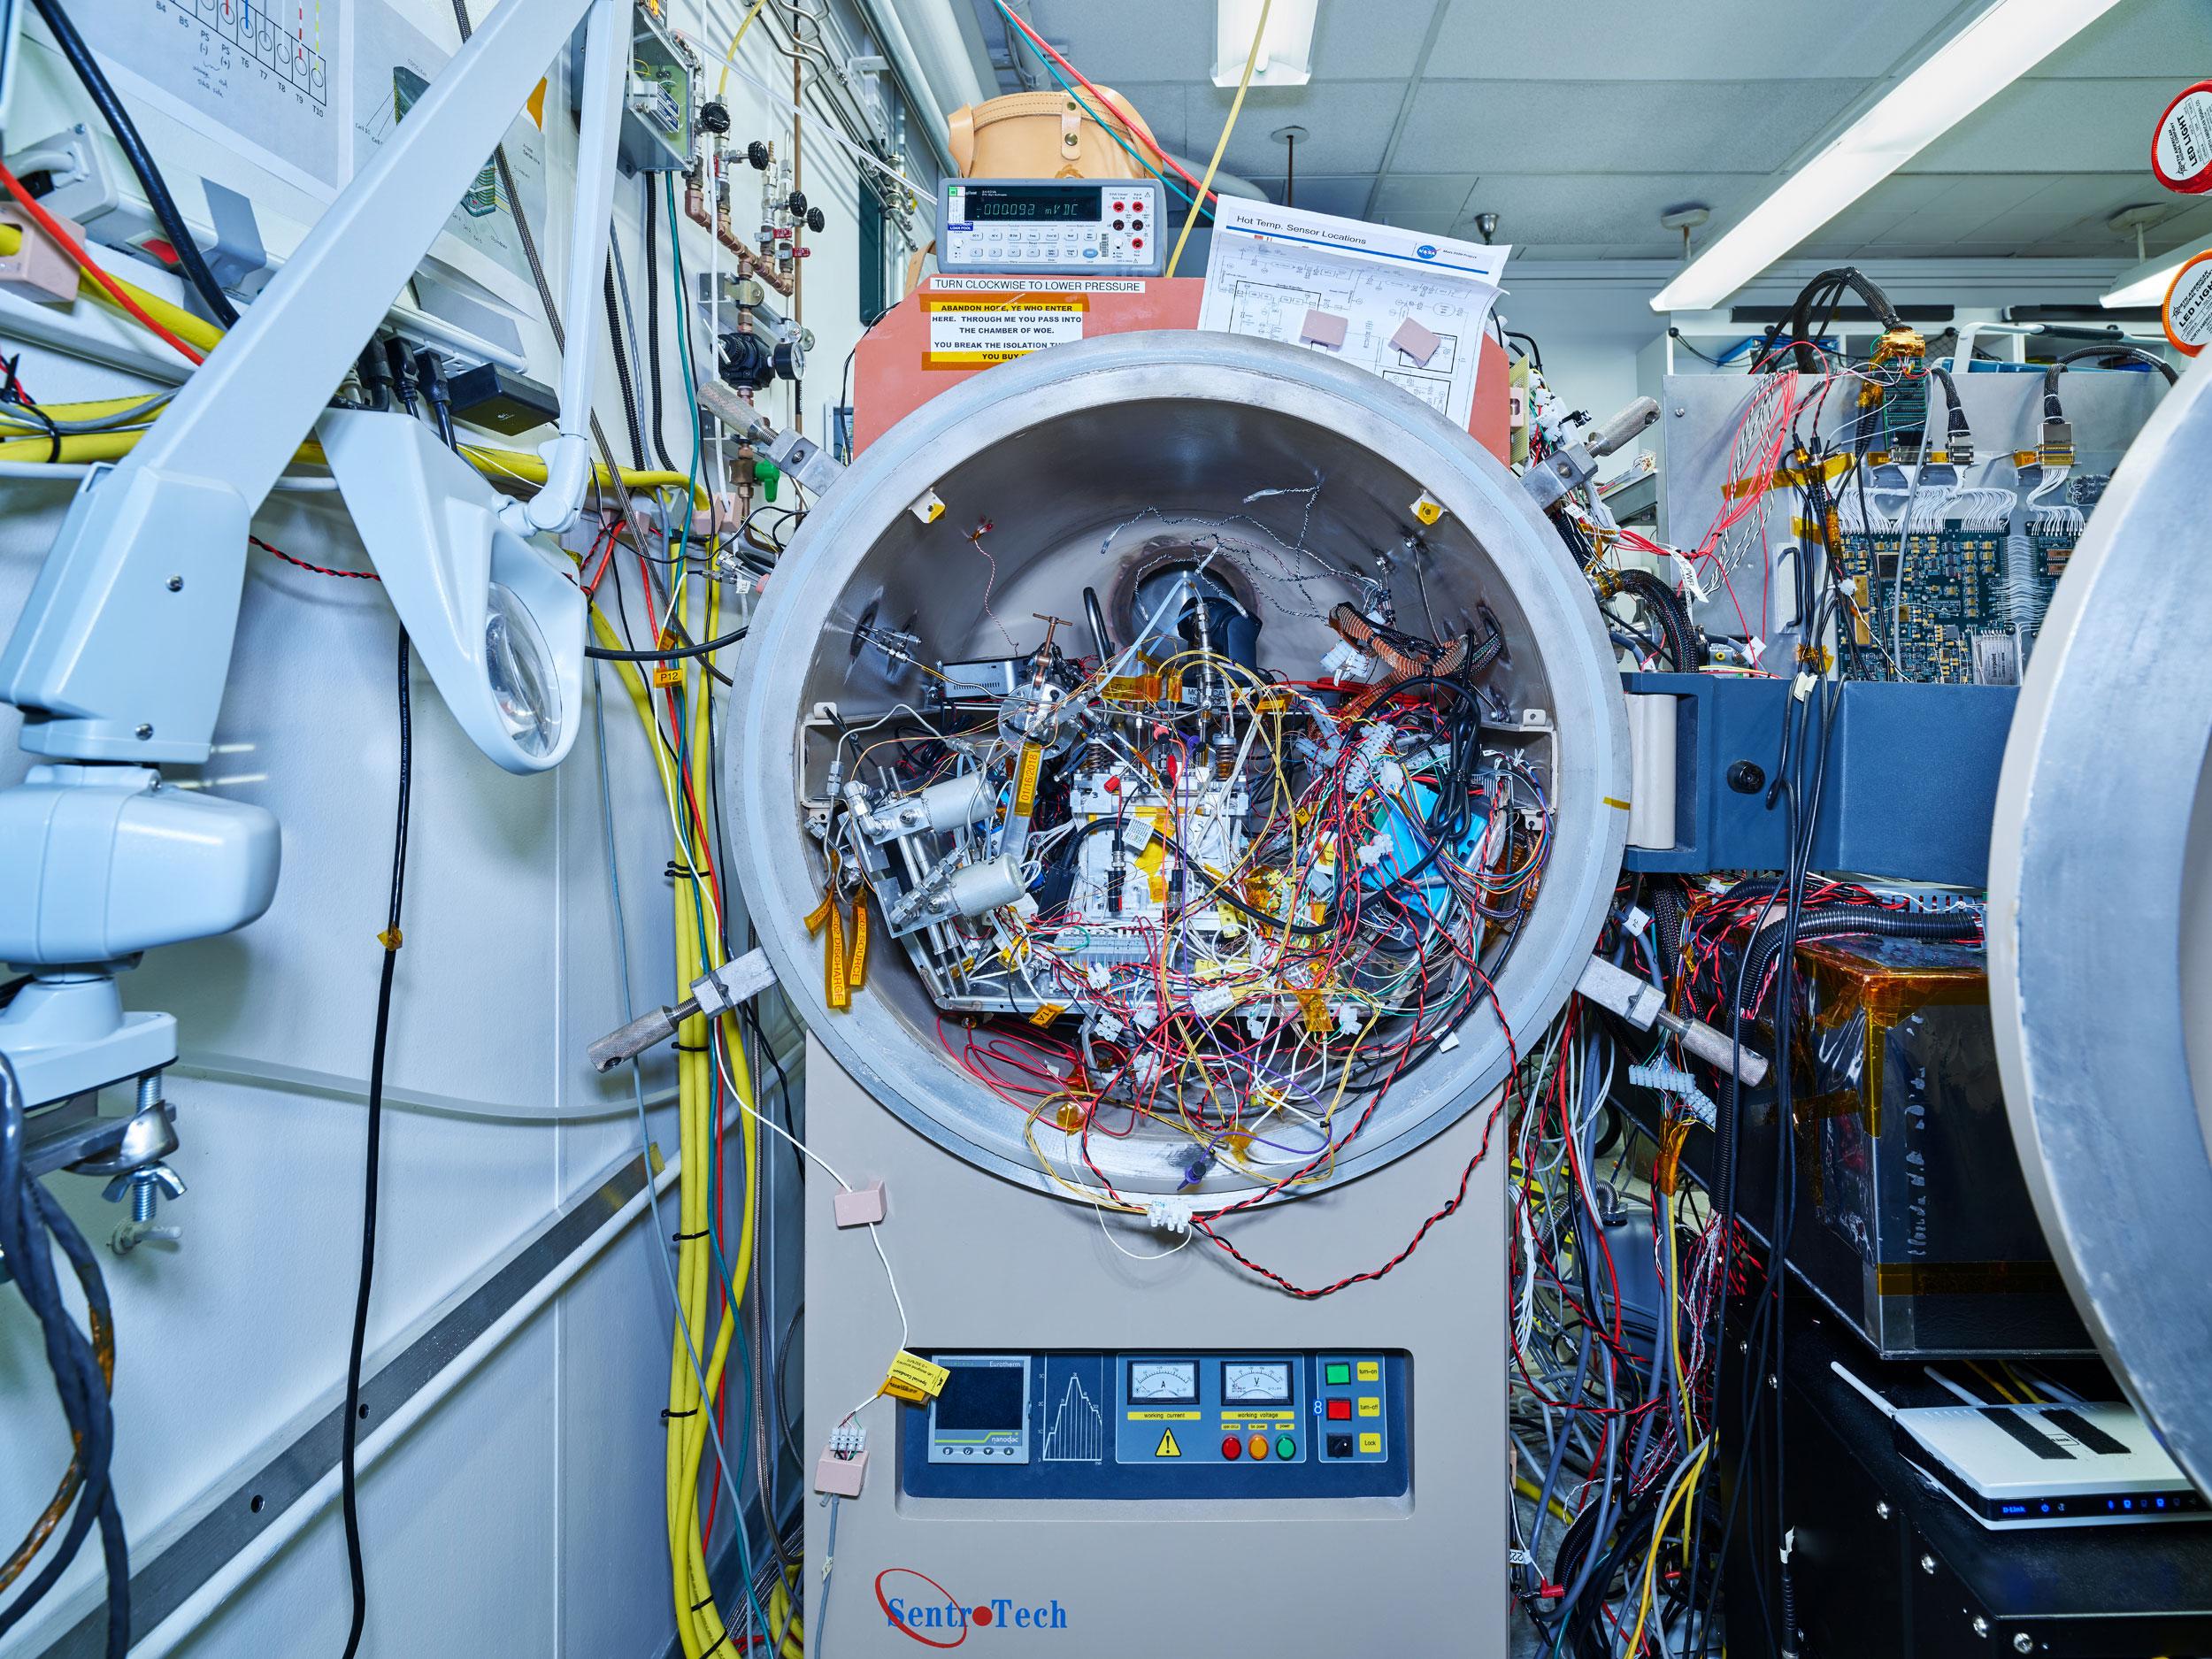 Mars Oxygen In-situ Resource Utilization Experiment, NASA/JPL, Pasadena, California, 2018